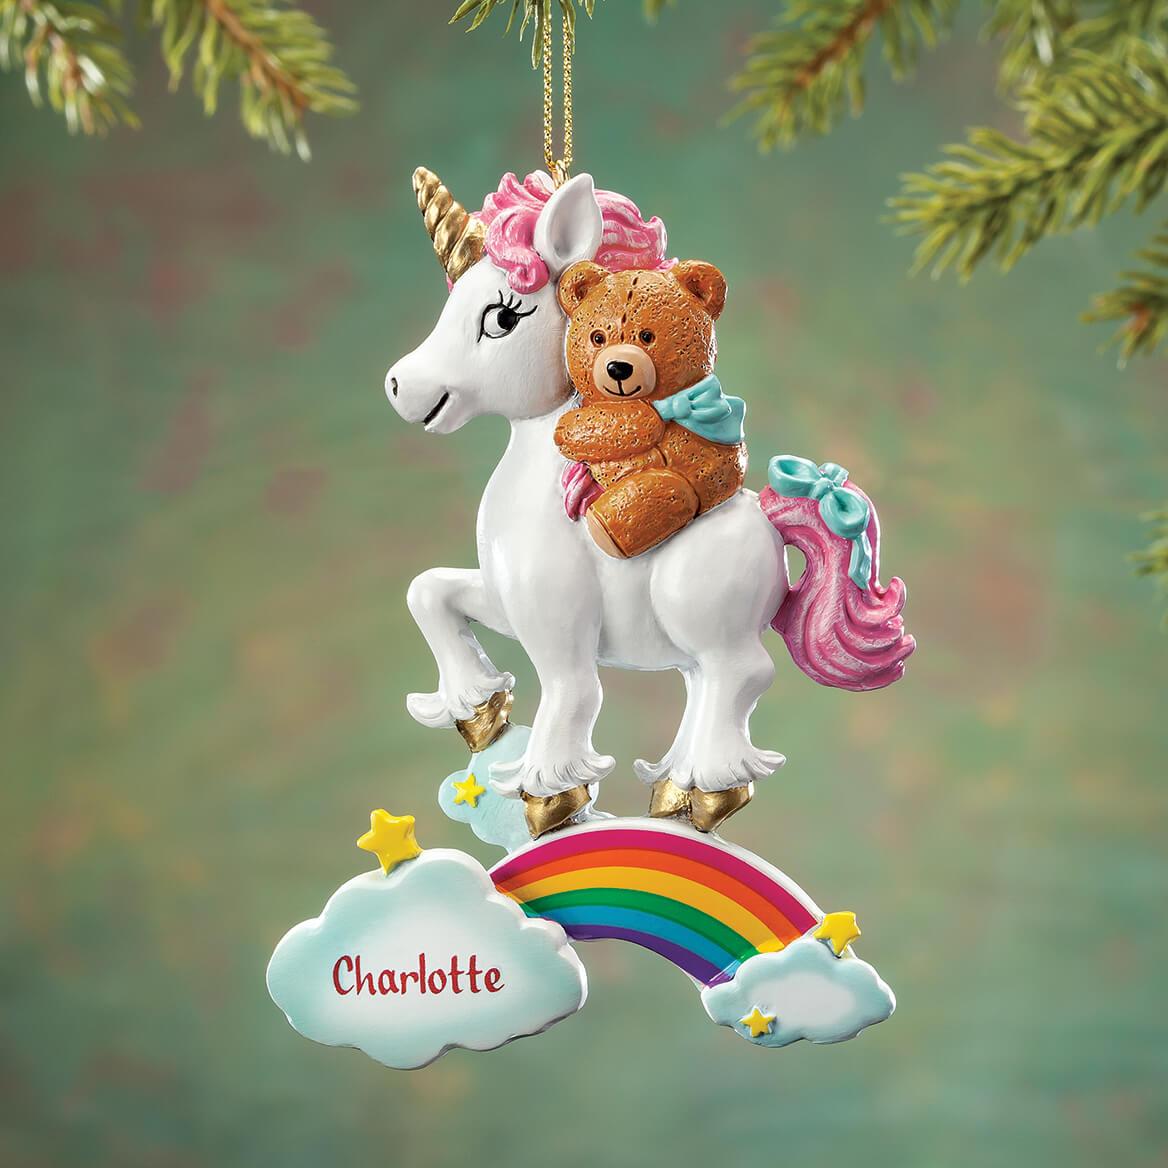 Personalized Teddy Bear & Unicorn Ornament-368110